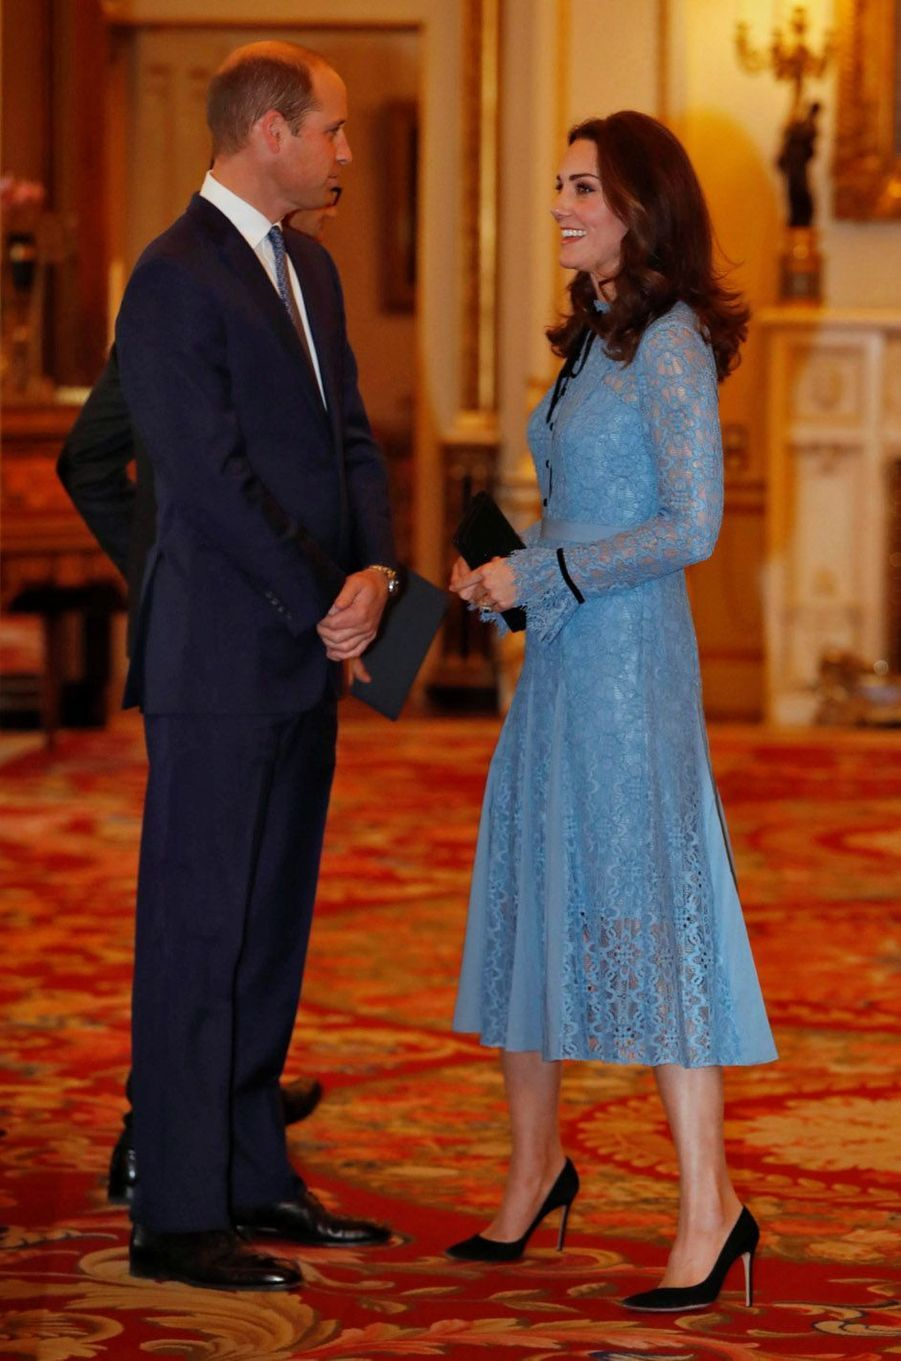 La duchesse de Cambridge en compagnie du prince William.